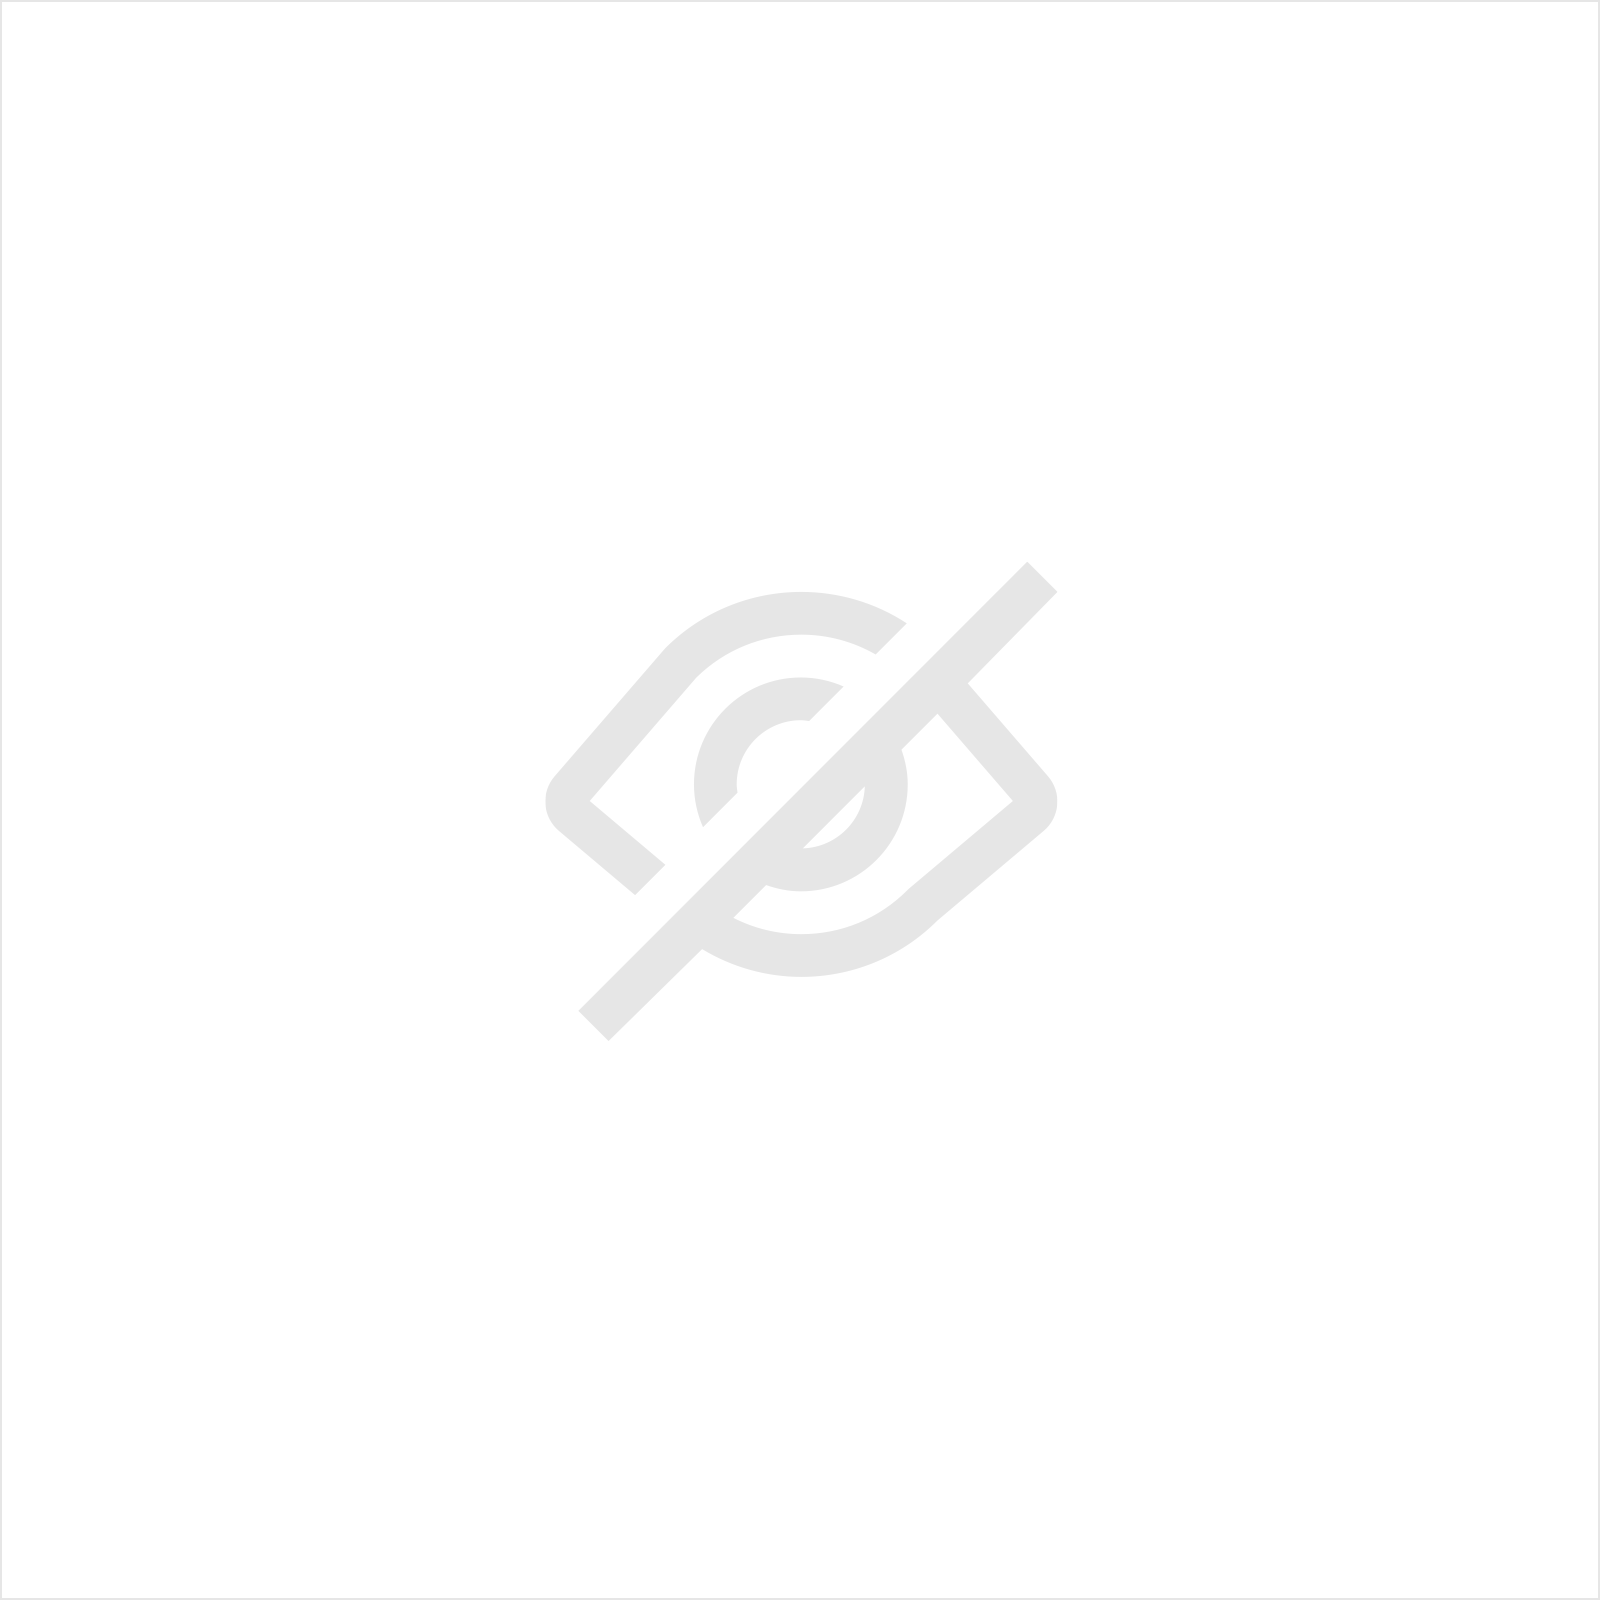 MASTIC POLYESTER RENFORCÉ AVEC DES PARTICULES DE MÉTAL 500G (Fill Métal 9020-500